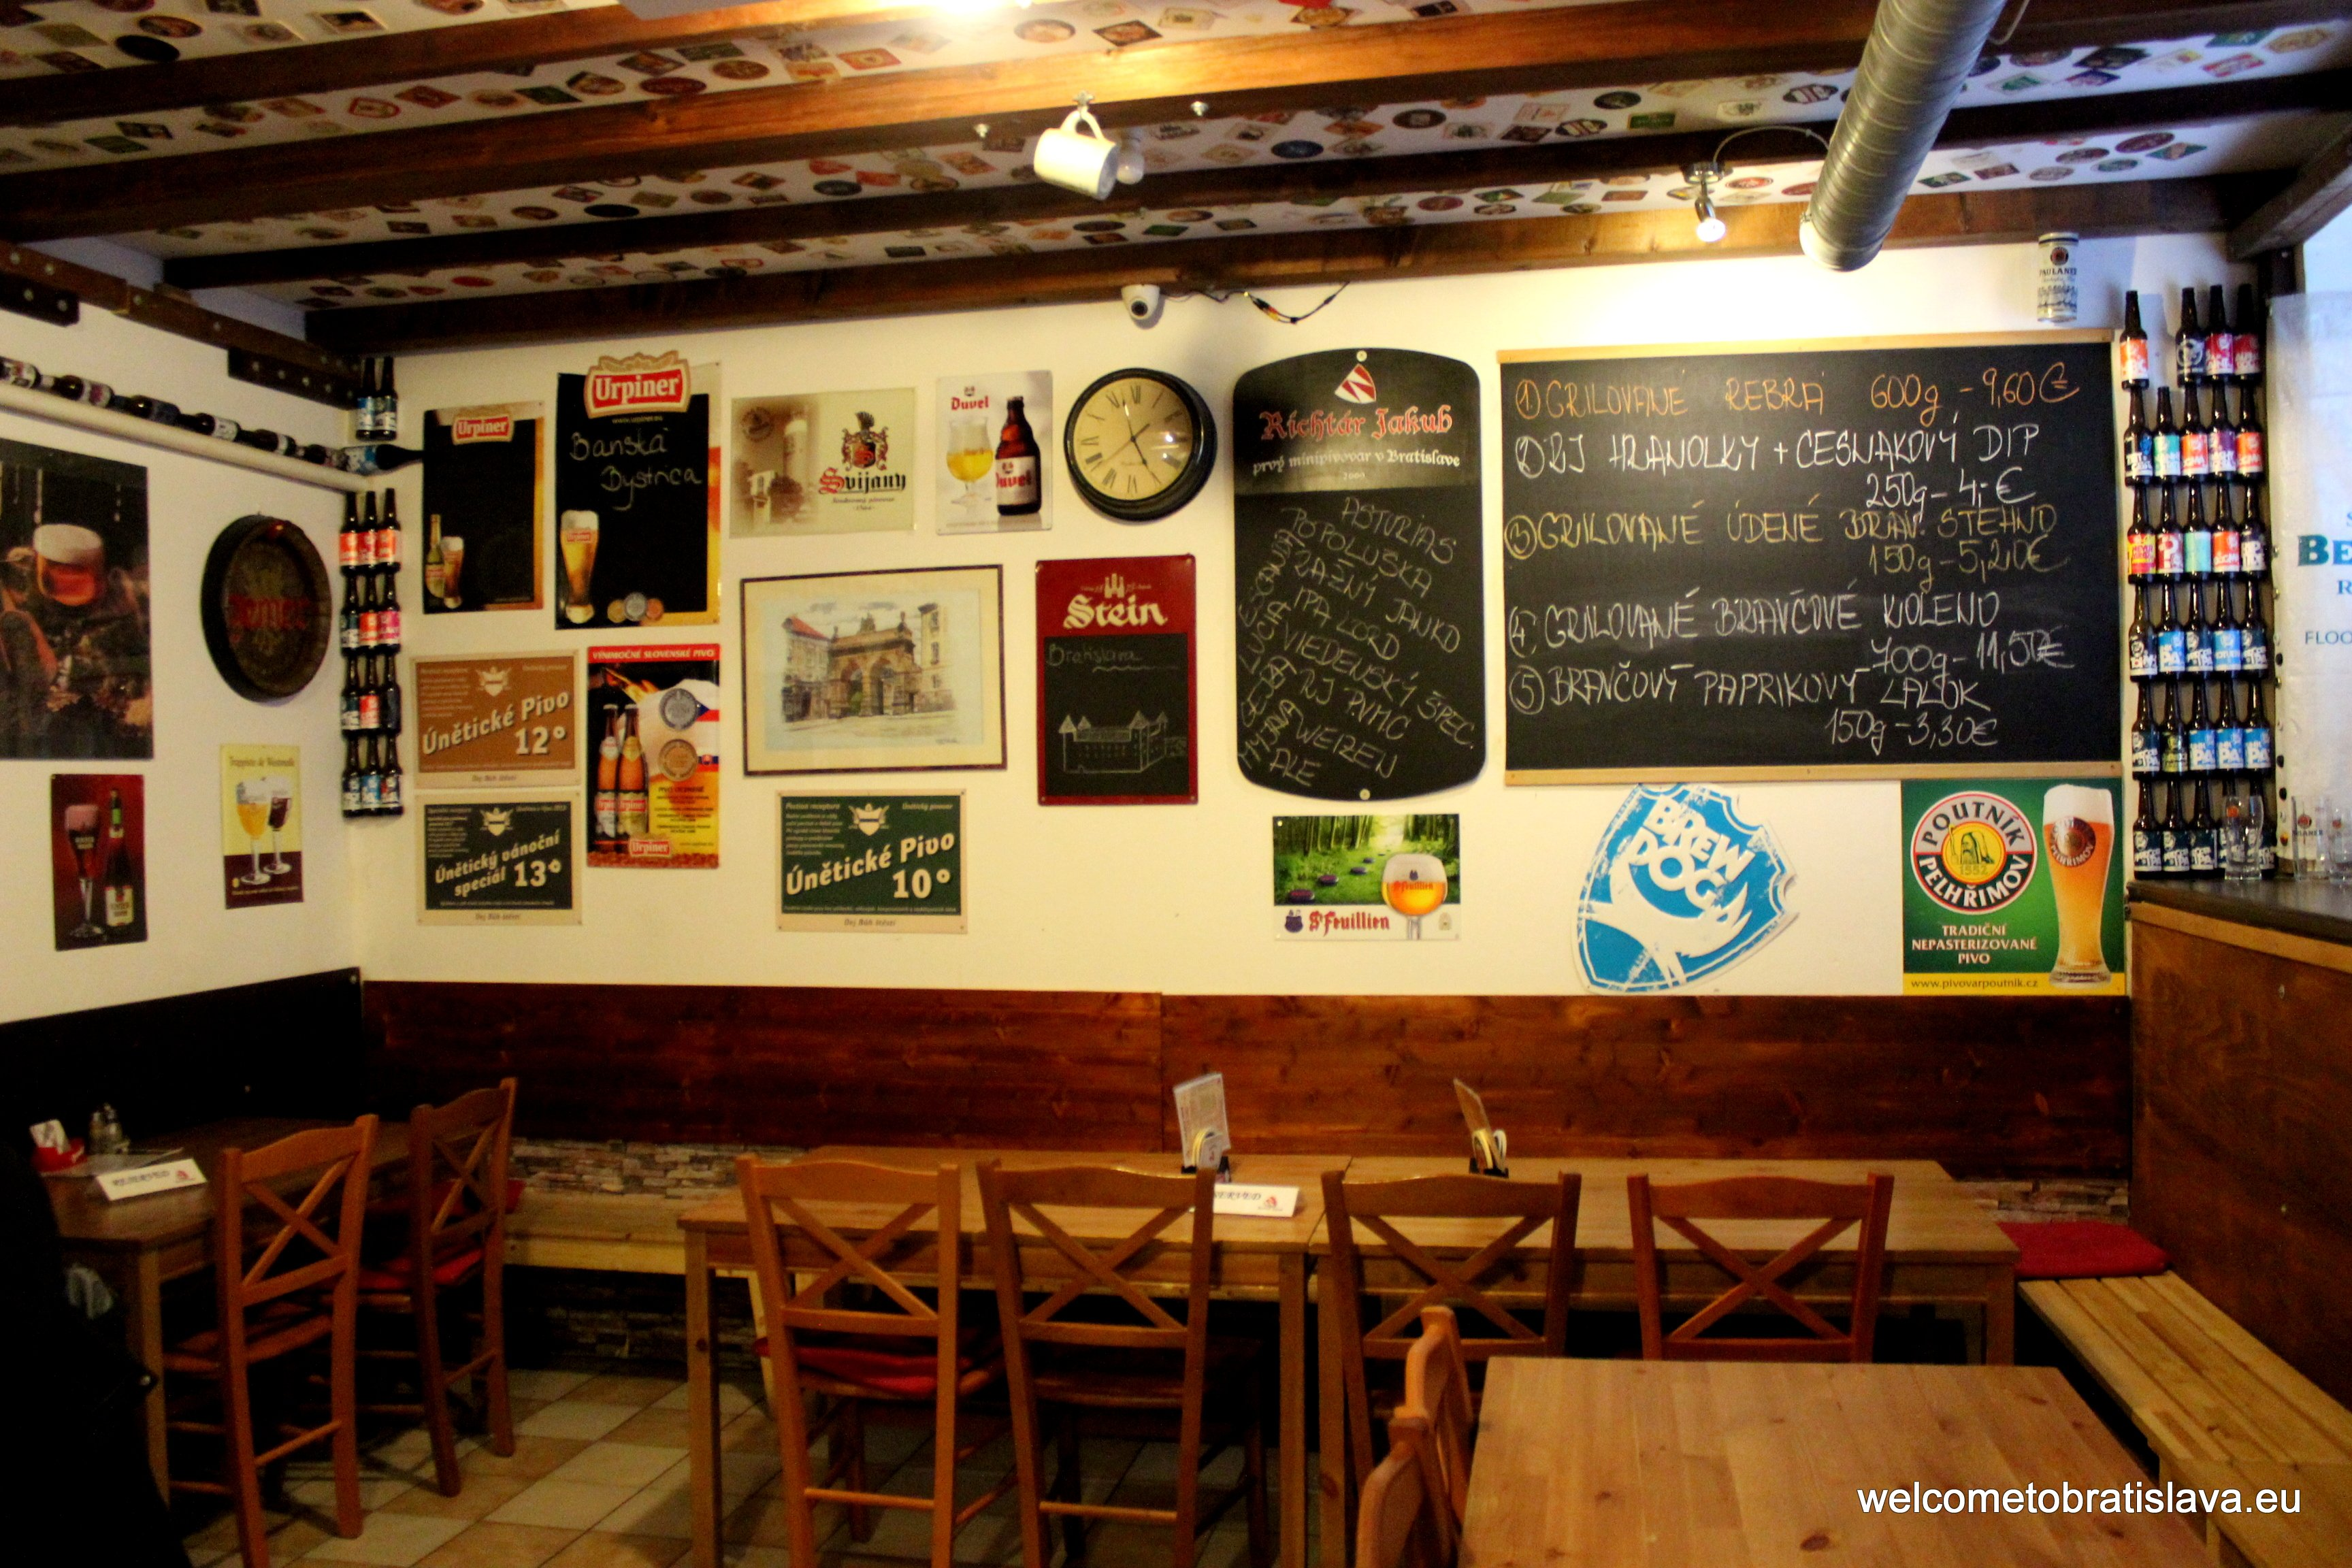 Best beer places in Bratislava - Hostinec Richtar Jakub